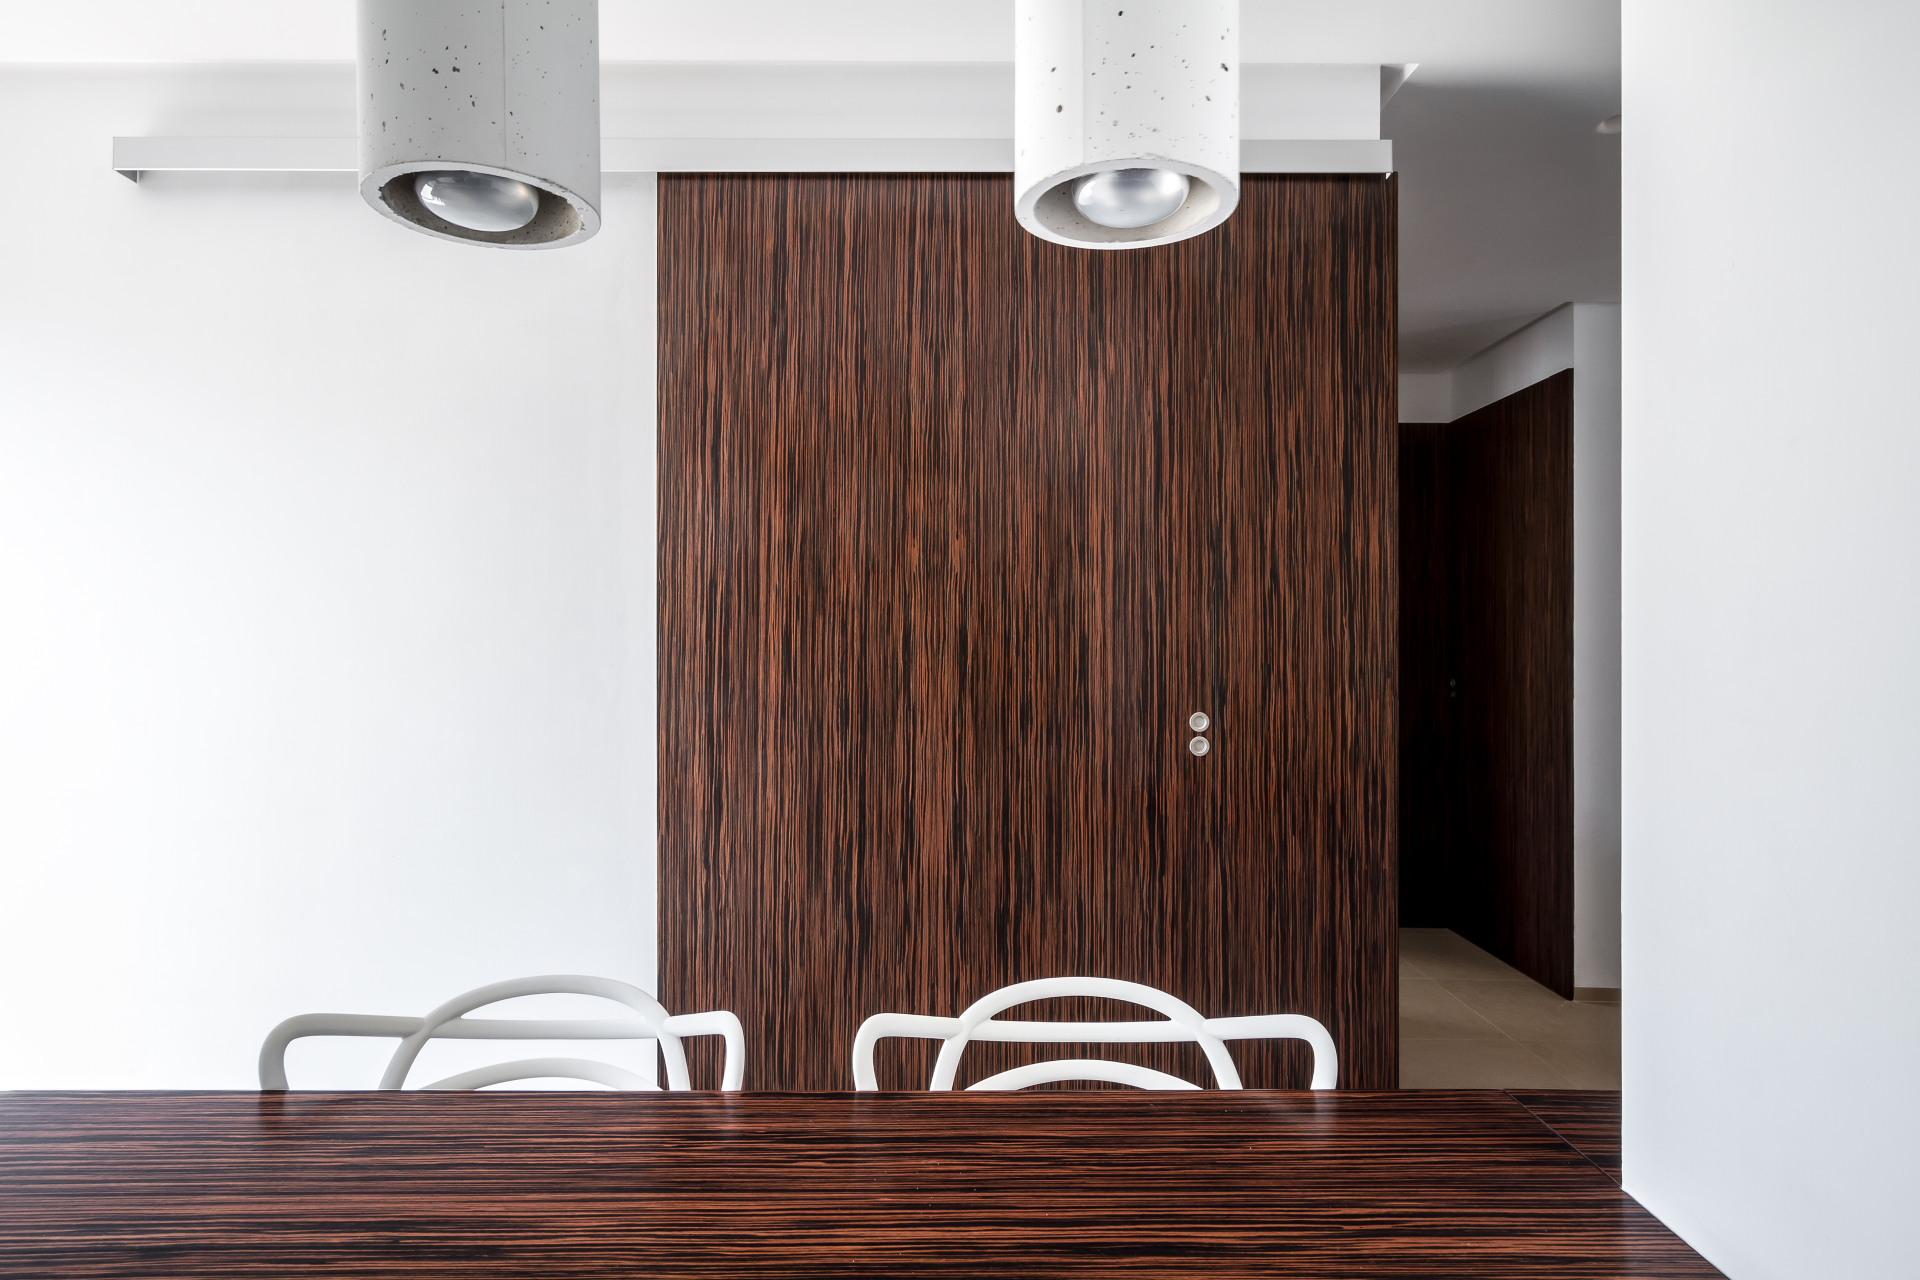 fotografia-arquitectura-valencia-german-cabo-selecta-home-denia (7)